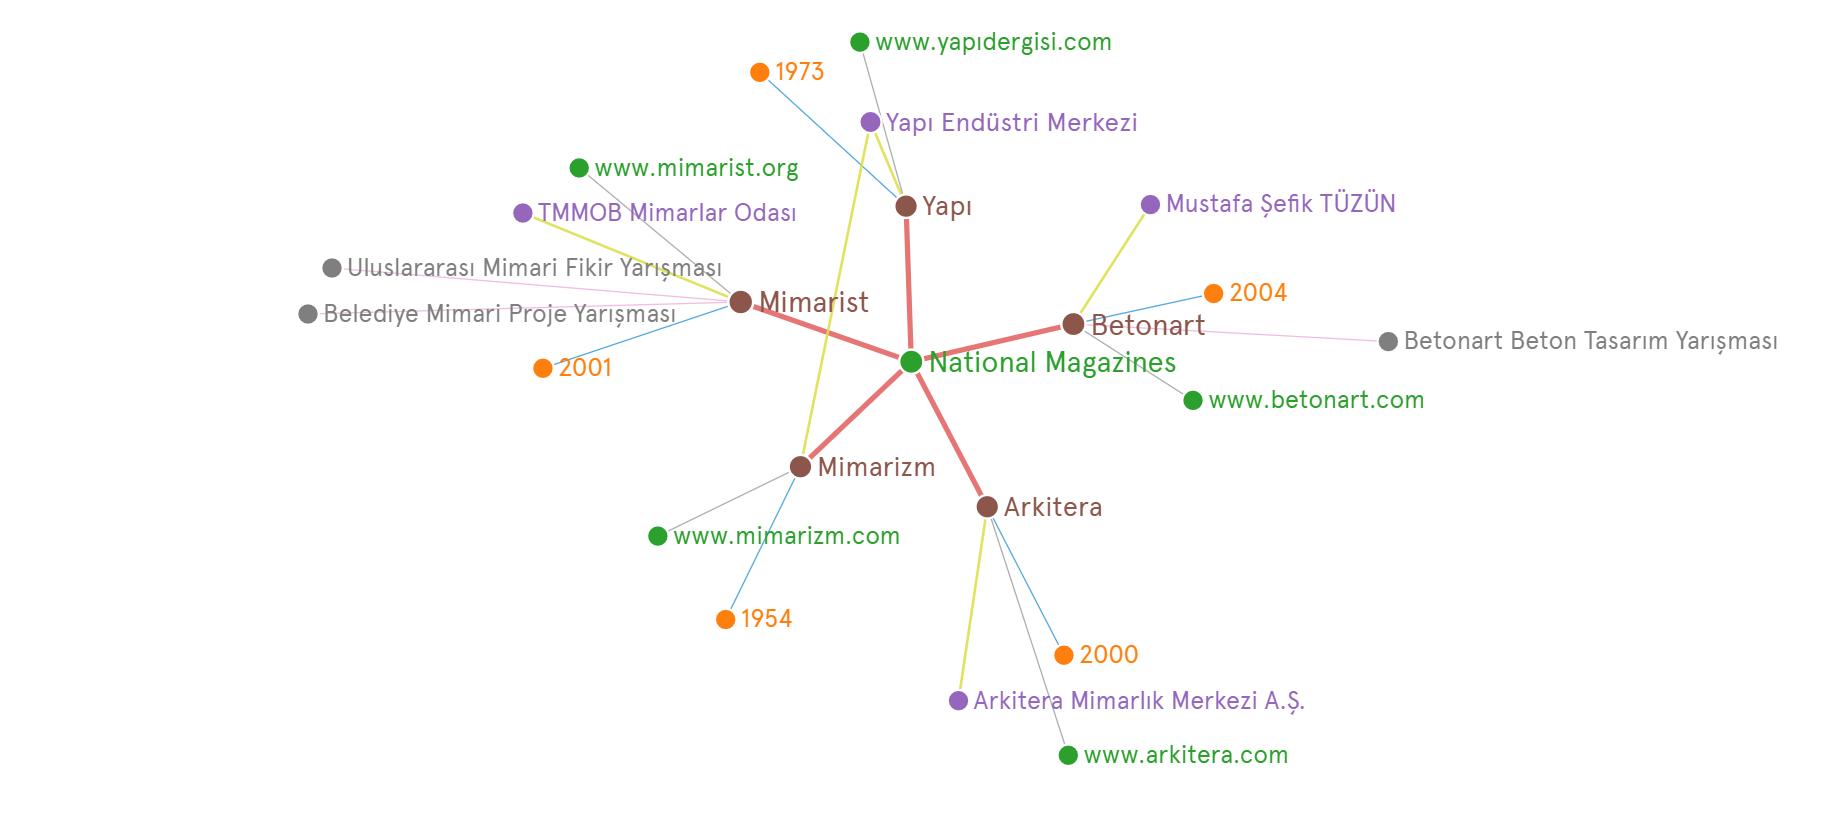 Mac 22 Graph Commons